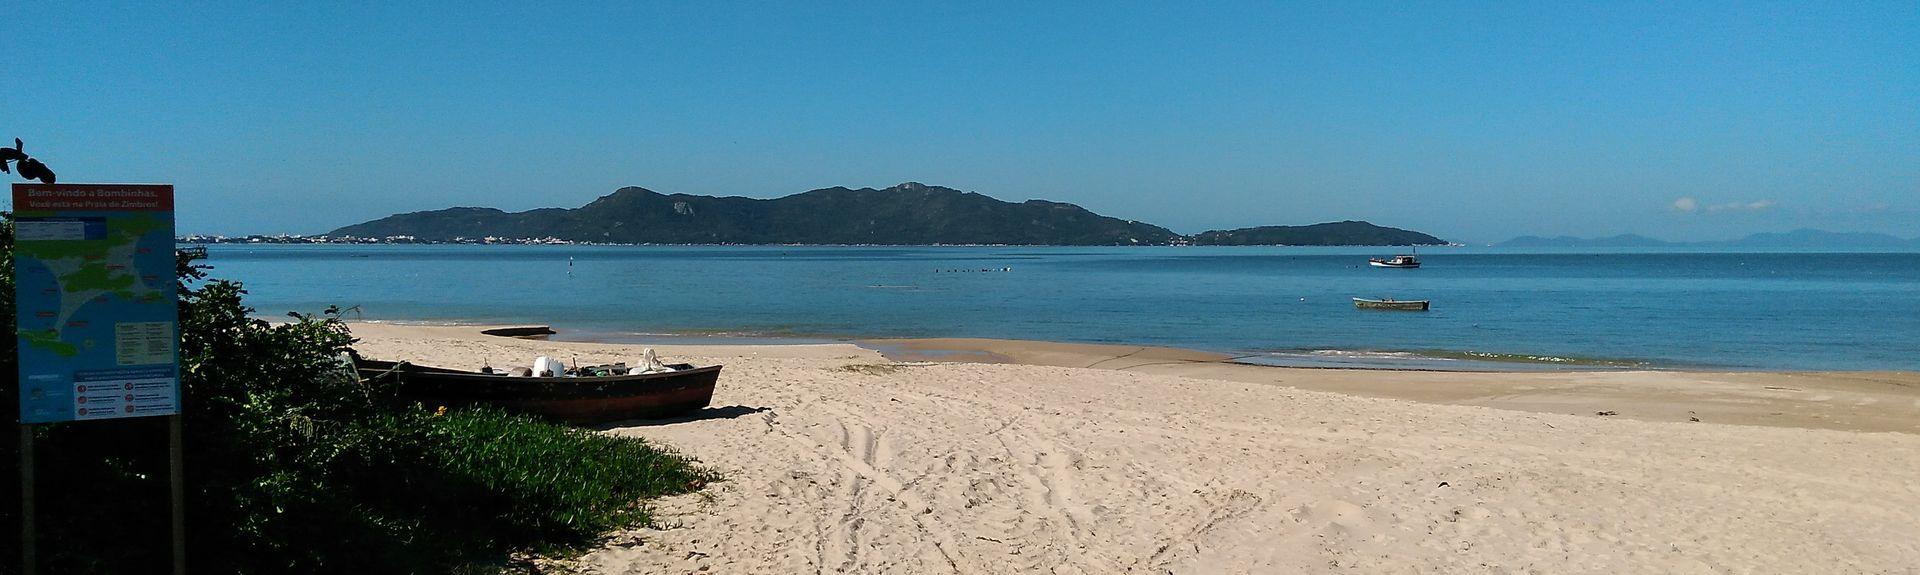 Amores Beach, Itajai, Santa Catarina (state), Brazil